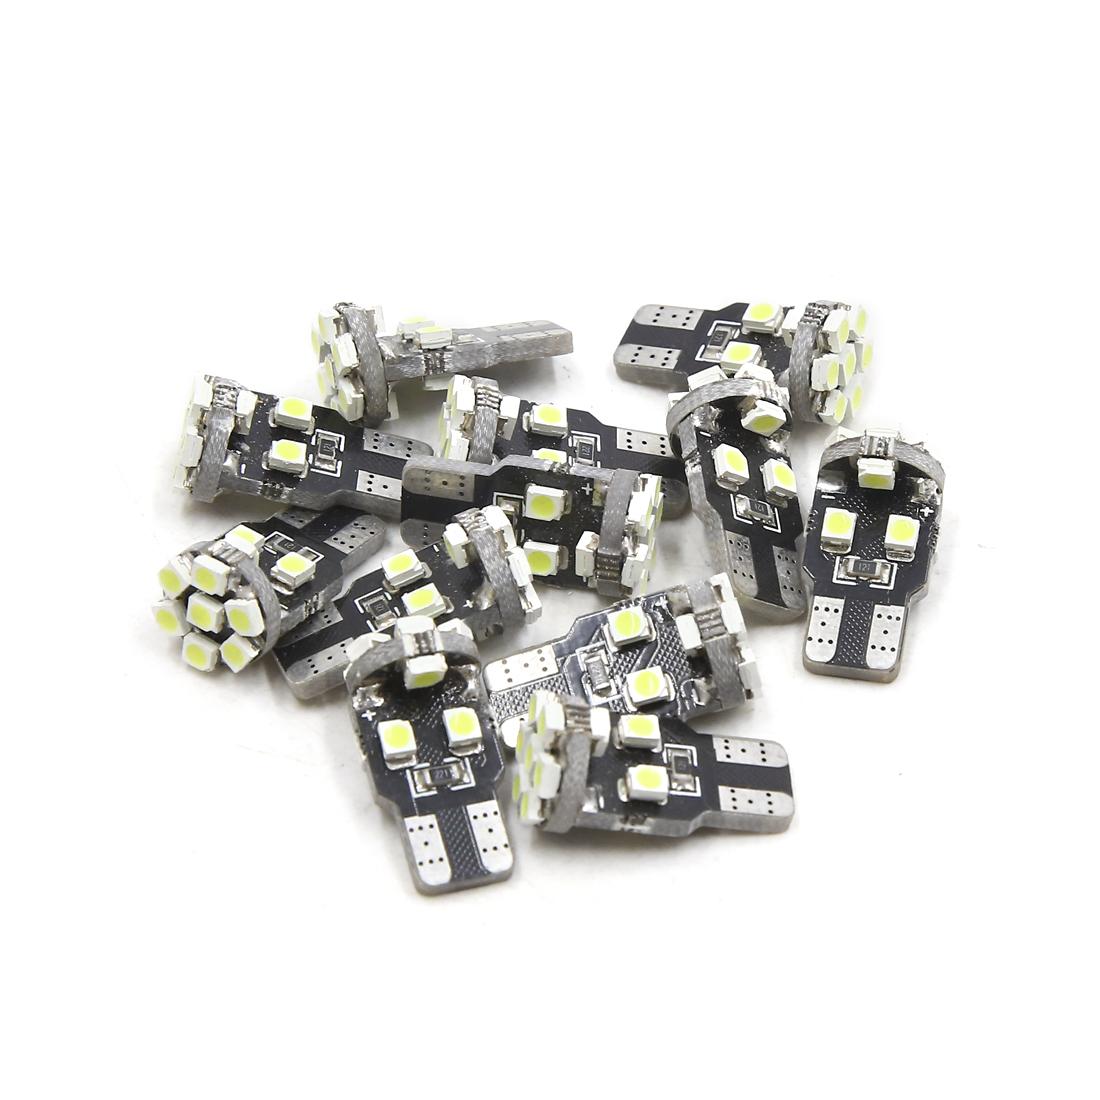 12Pcs T10 White 13 1210-SMD Canbus LEDs Car Panel Light Interior W5W 192 158 194